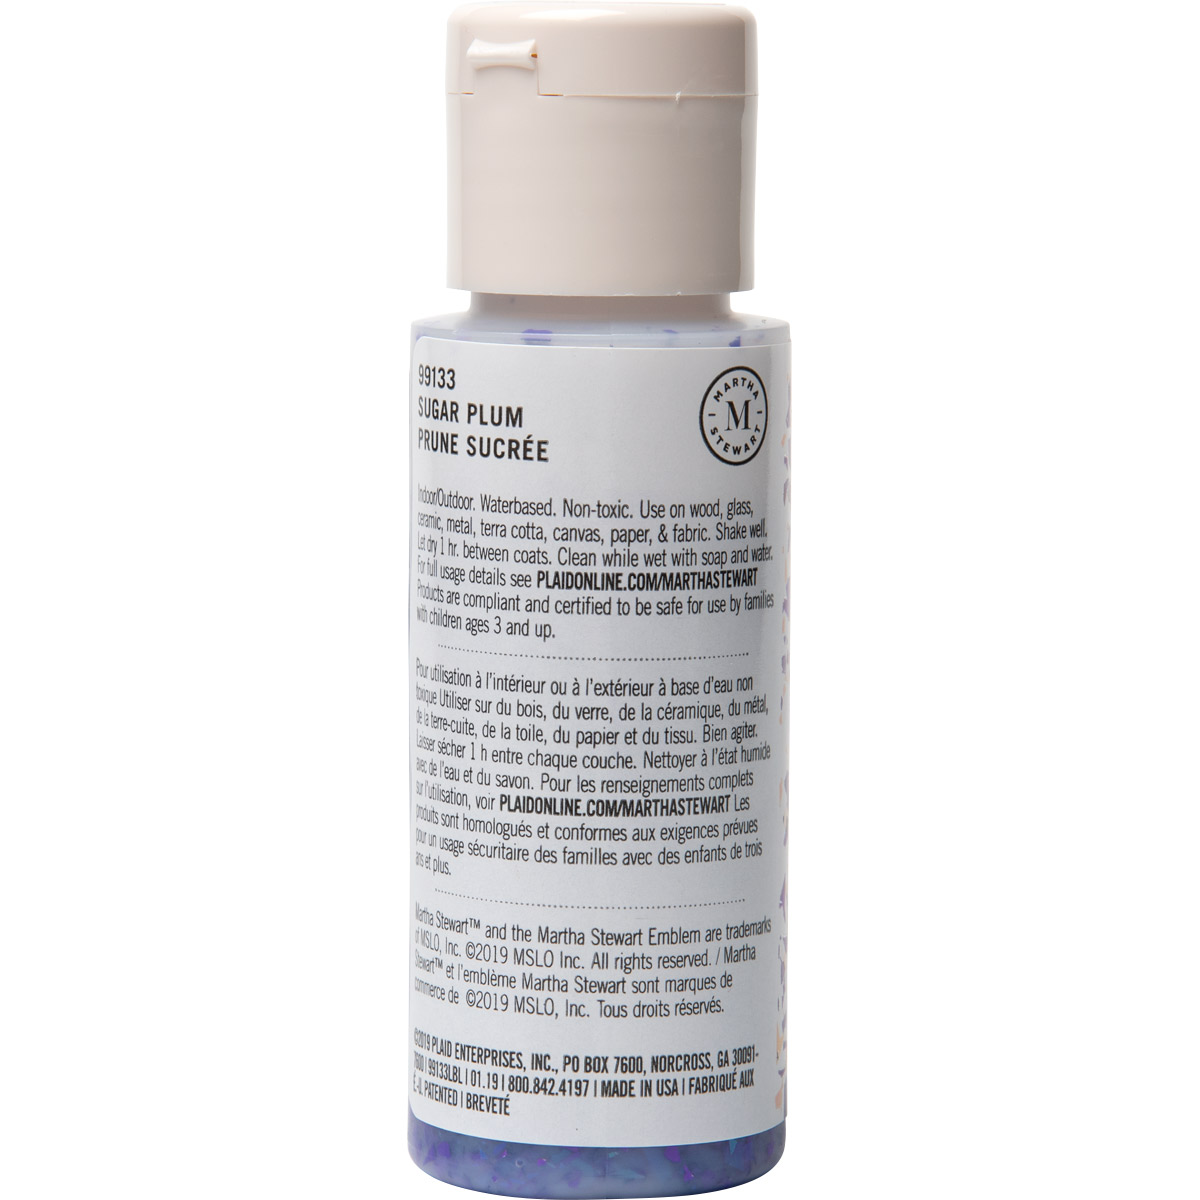 Martha Stewart ® Multi-Surface Vintage Leaf Glitter Acrylic Craft Paint CPSIA - Sugar Plum, 2 oz. -